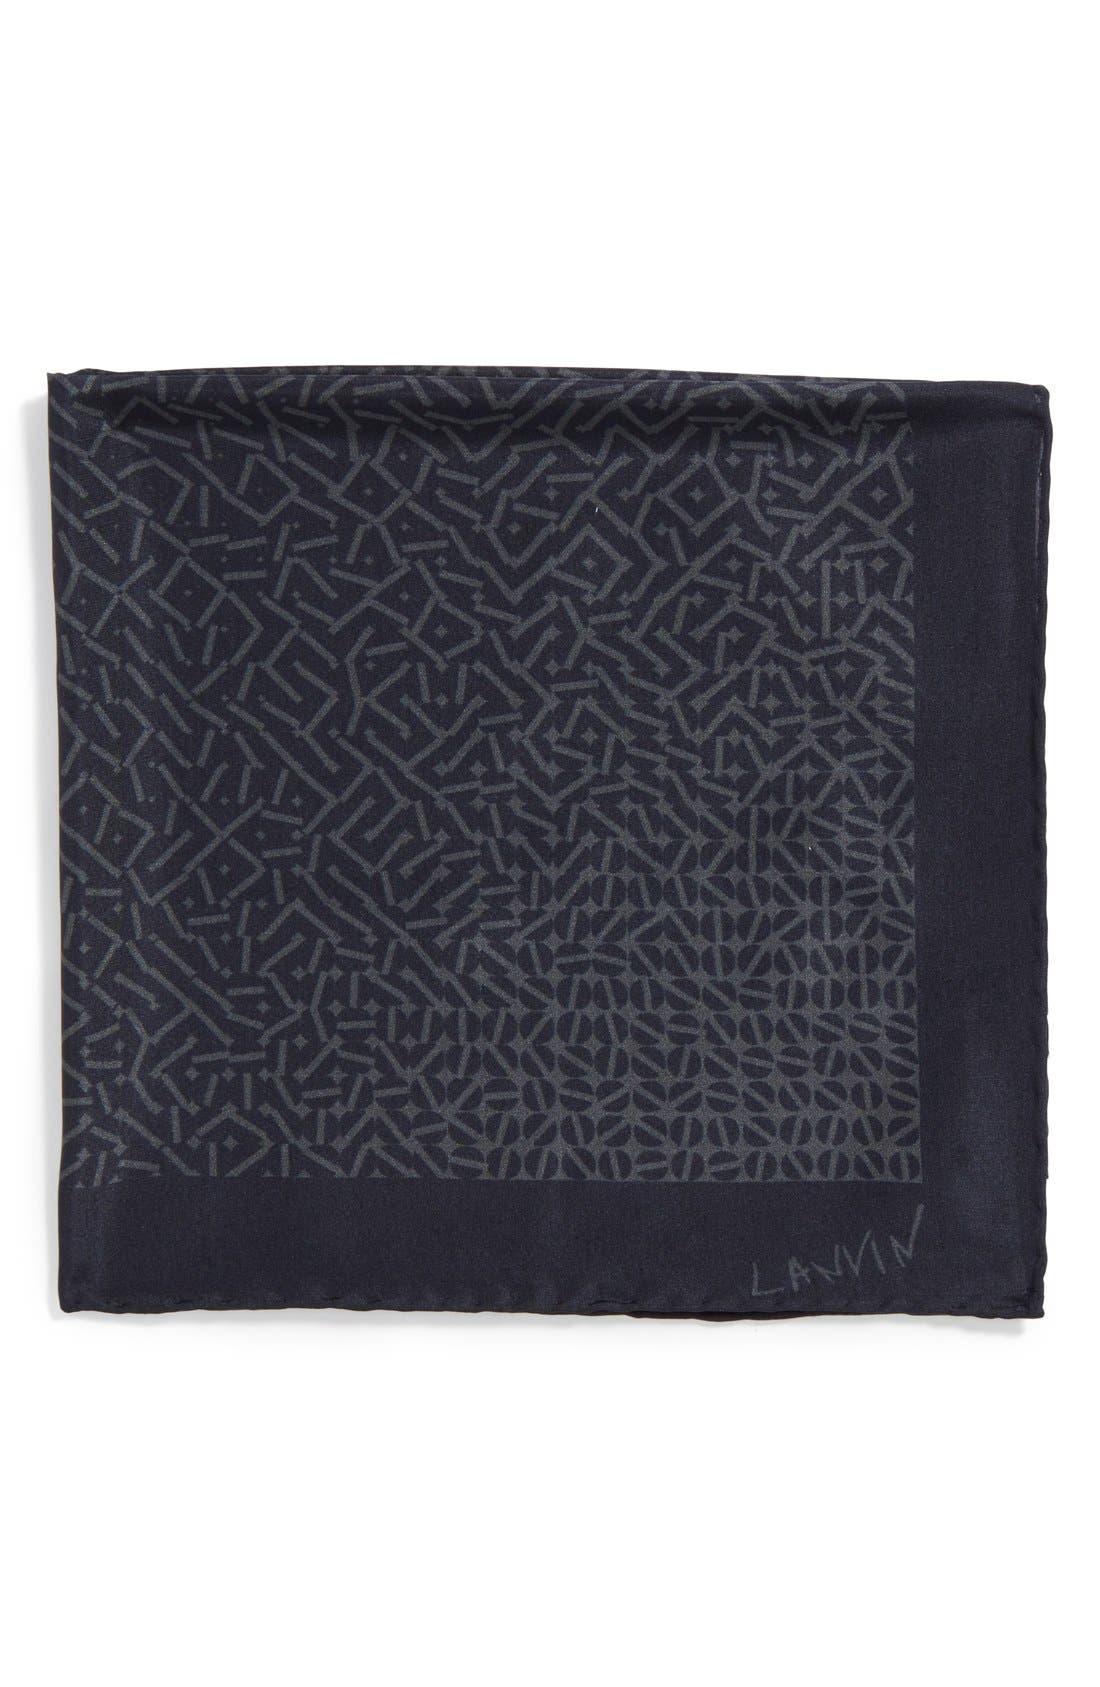 Main Image - Lanvin Print Pocket Square